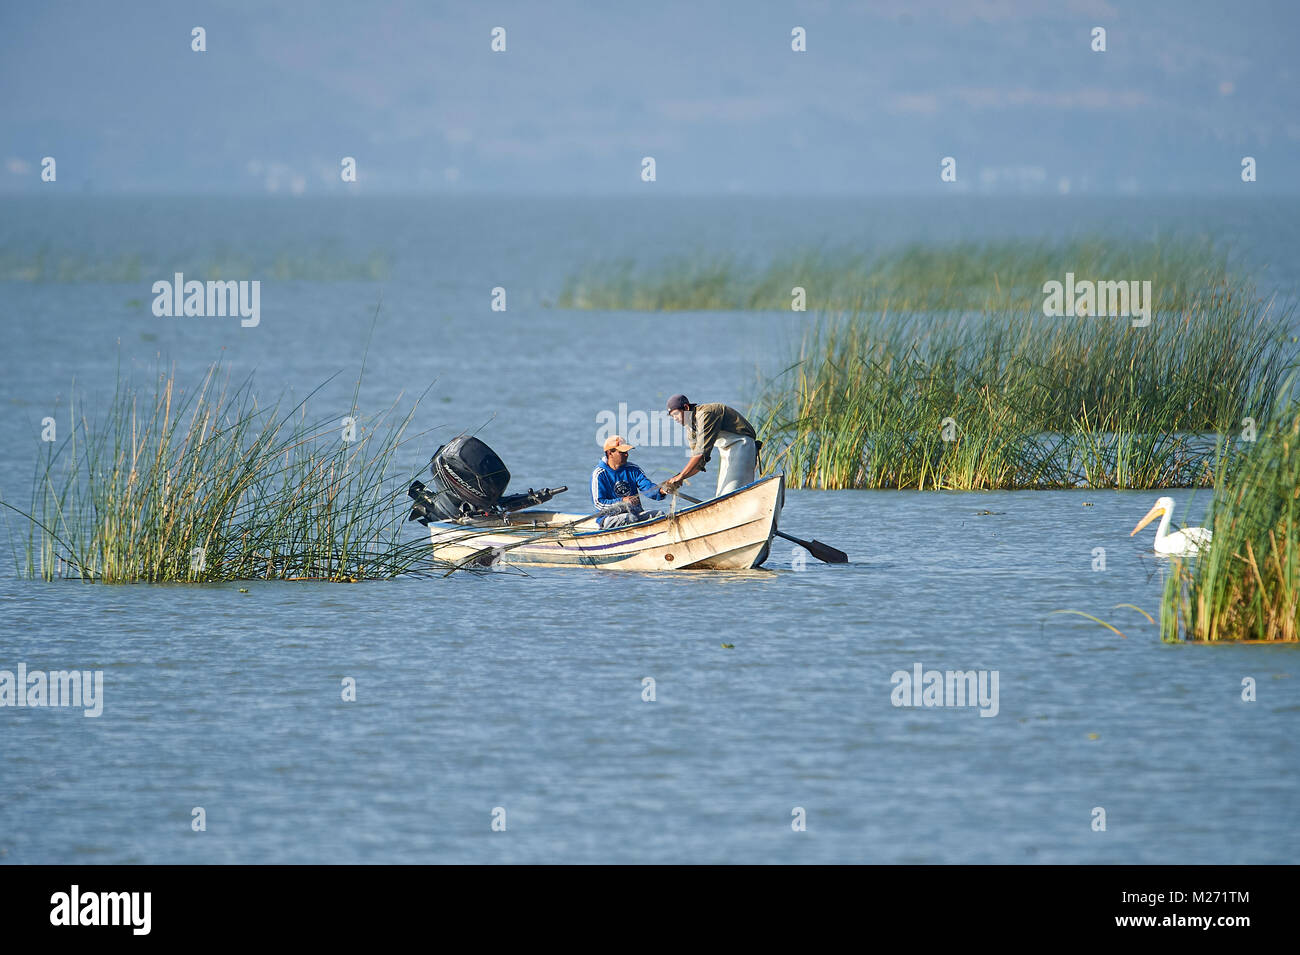 Fishermen at work on Lake Chapala, Ajijic, Jalisco, Mexico, Lake Chapala is the biggest freshwater lake in Mexico - Stock Image